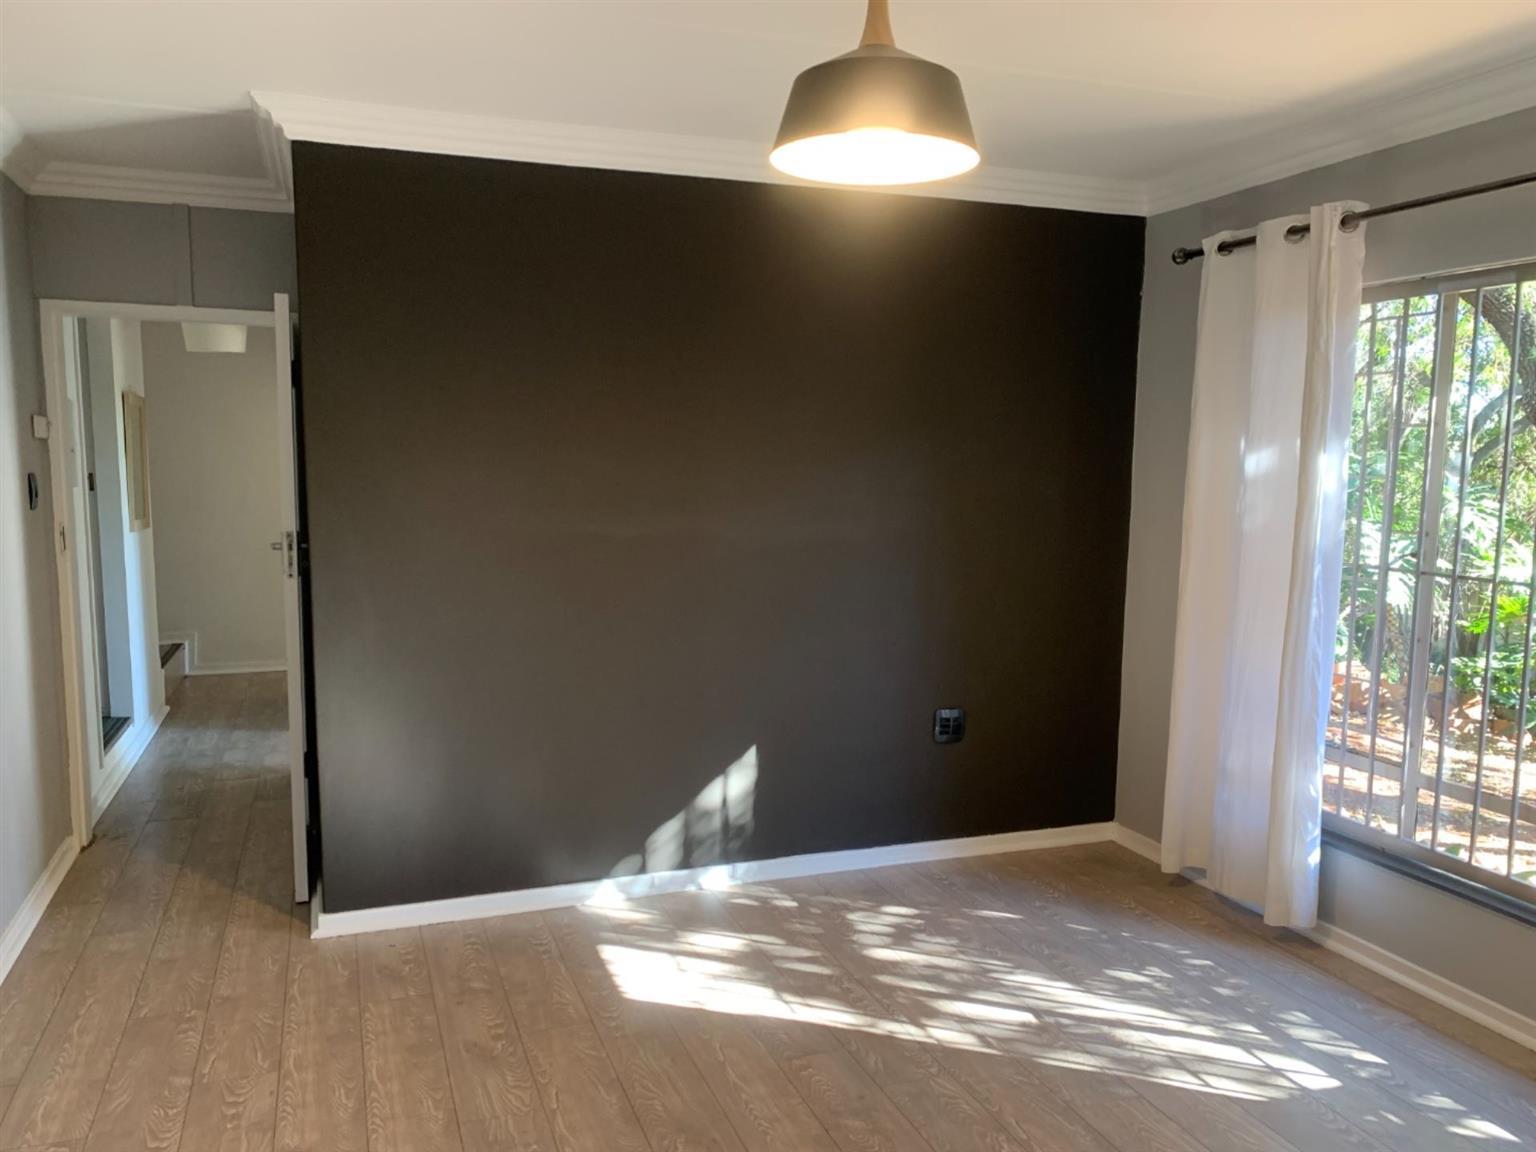 House Rental Monthly in FAERIE GLEN